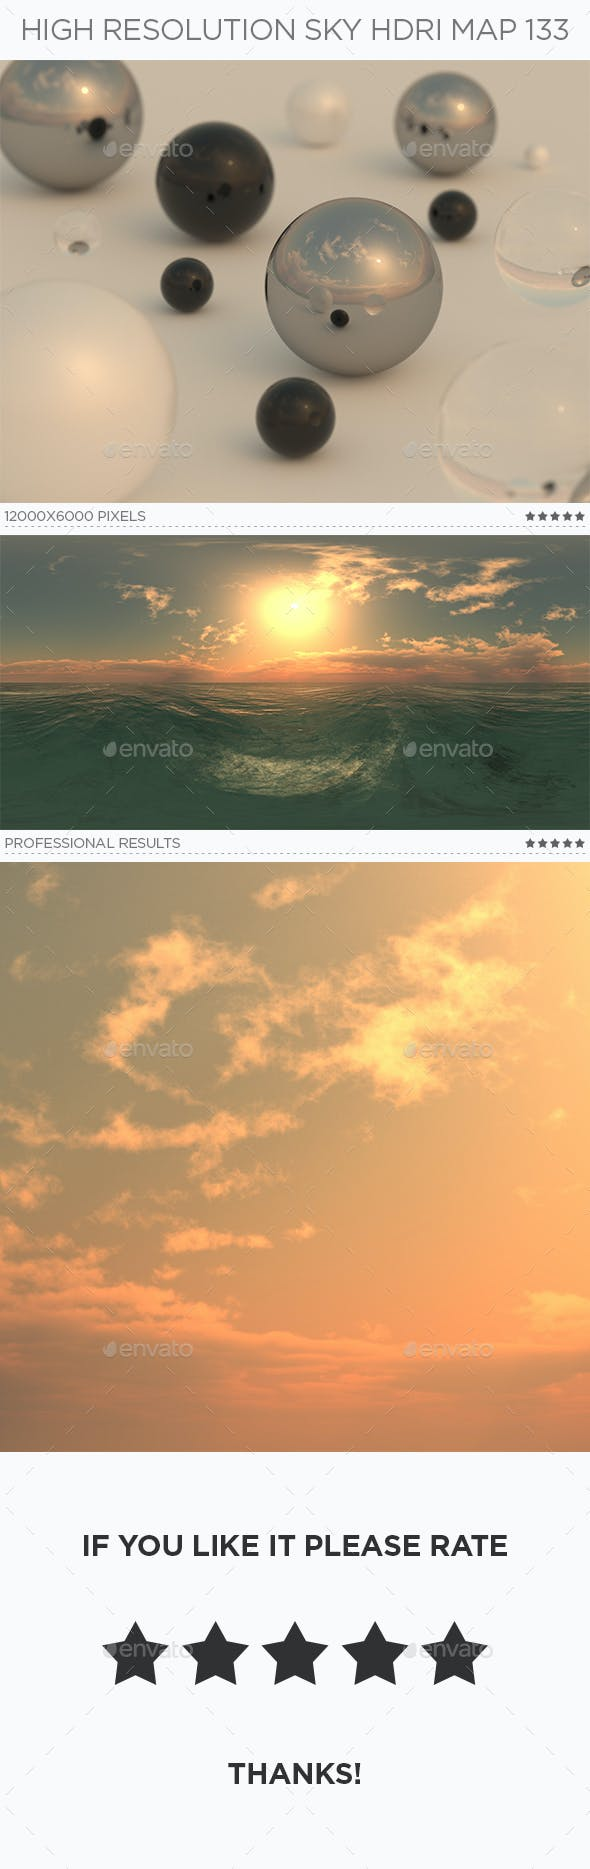 High Resolution Sky HDRi Map 133 - 3DOcean Item for Sale